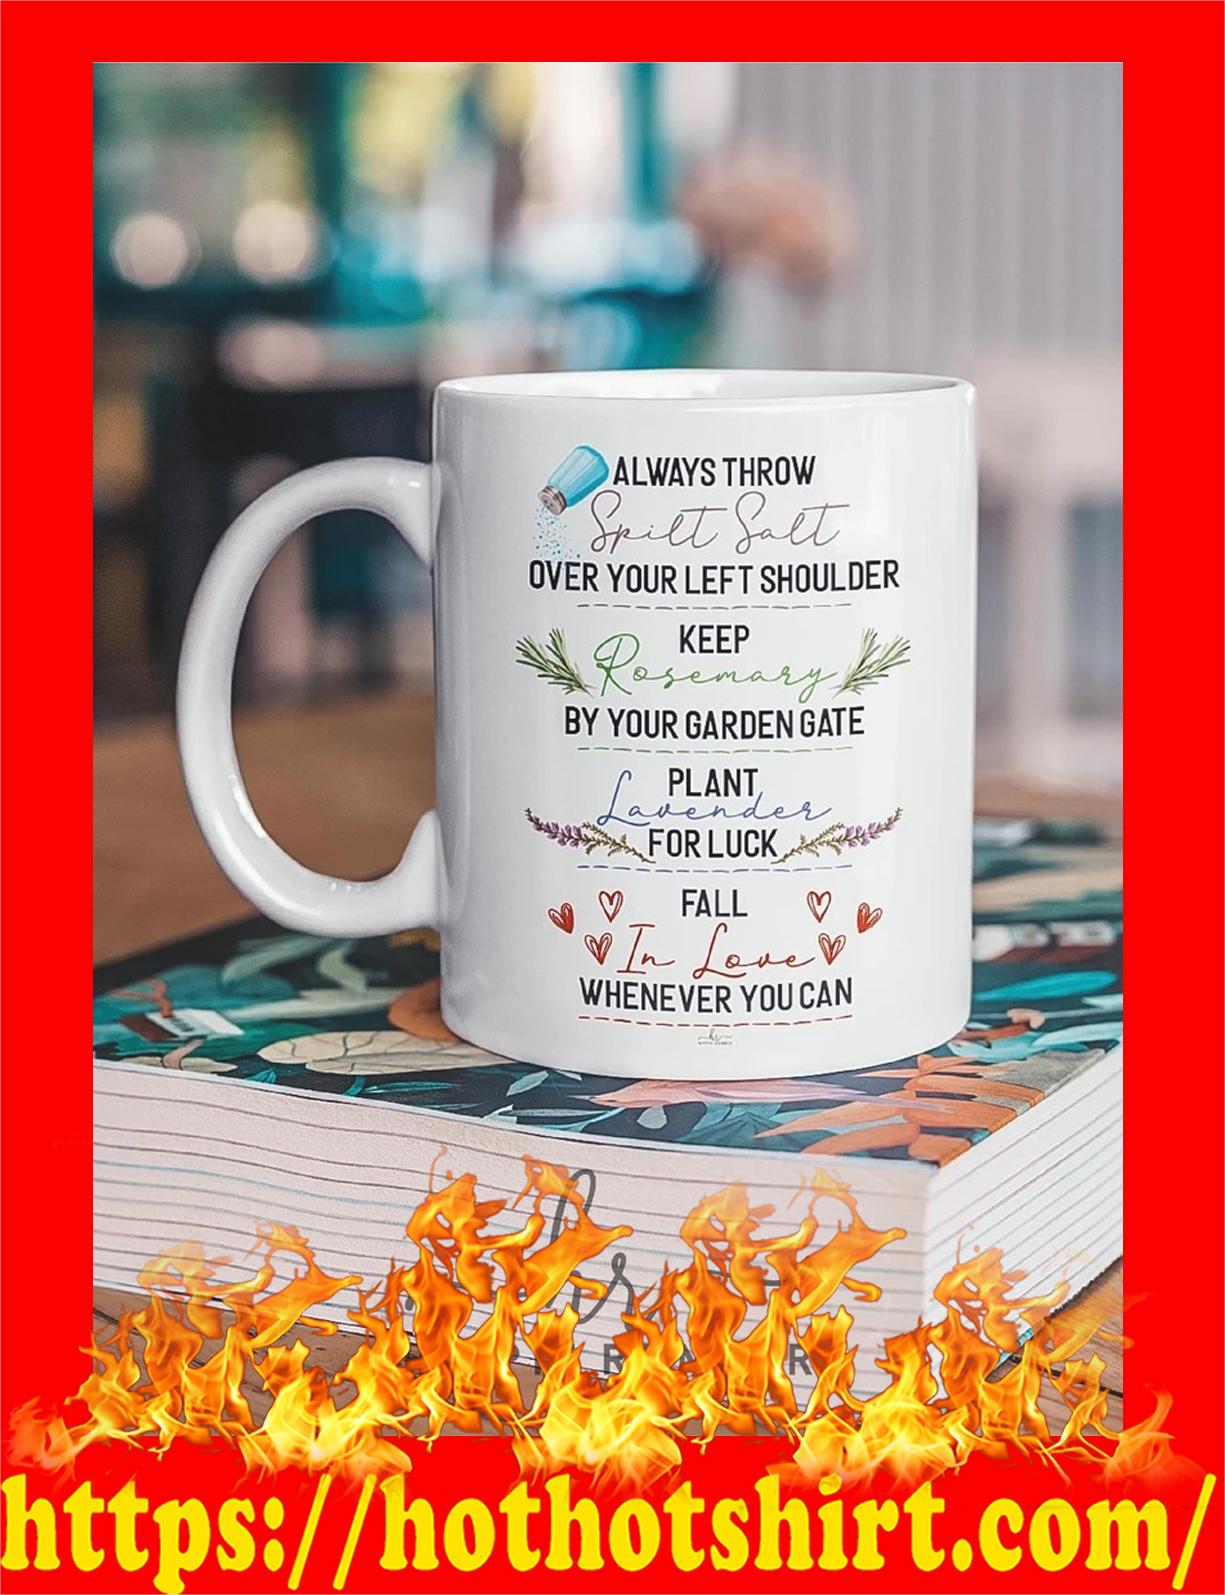 Always throw spilt salt over your left shoulder keep rosemary mug - detail